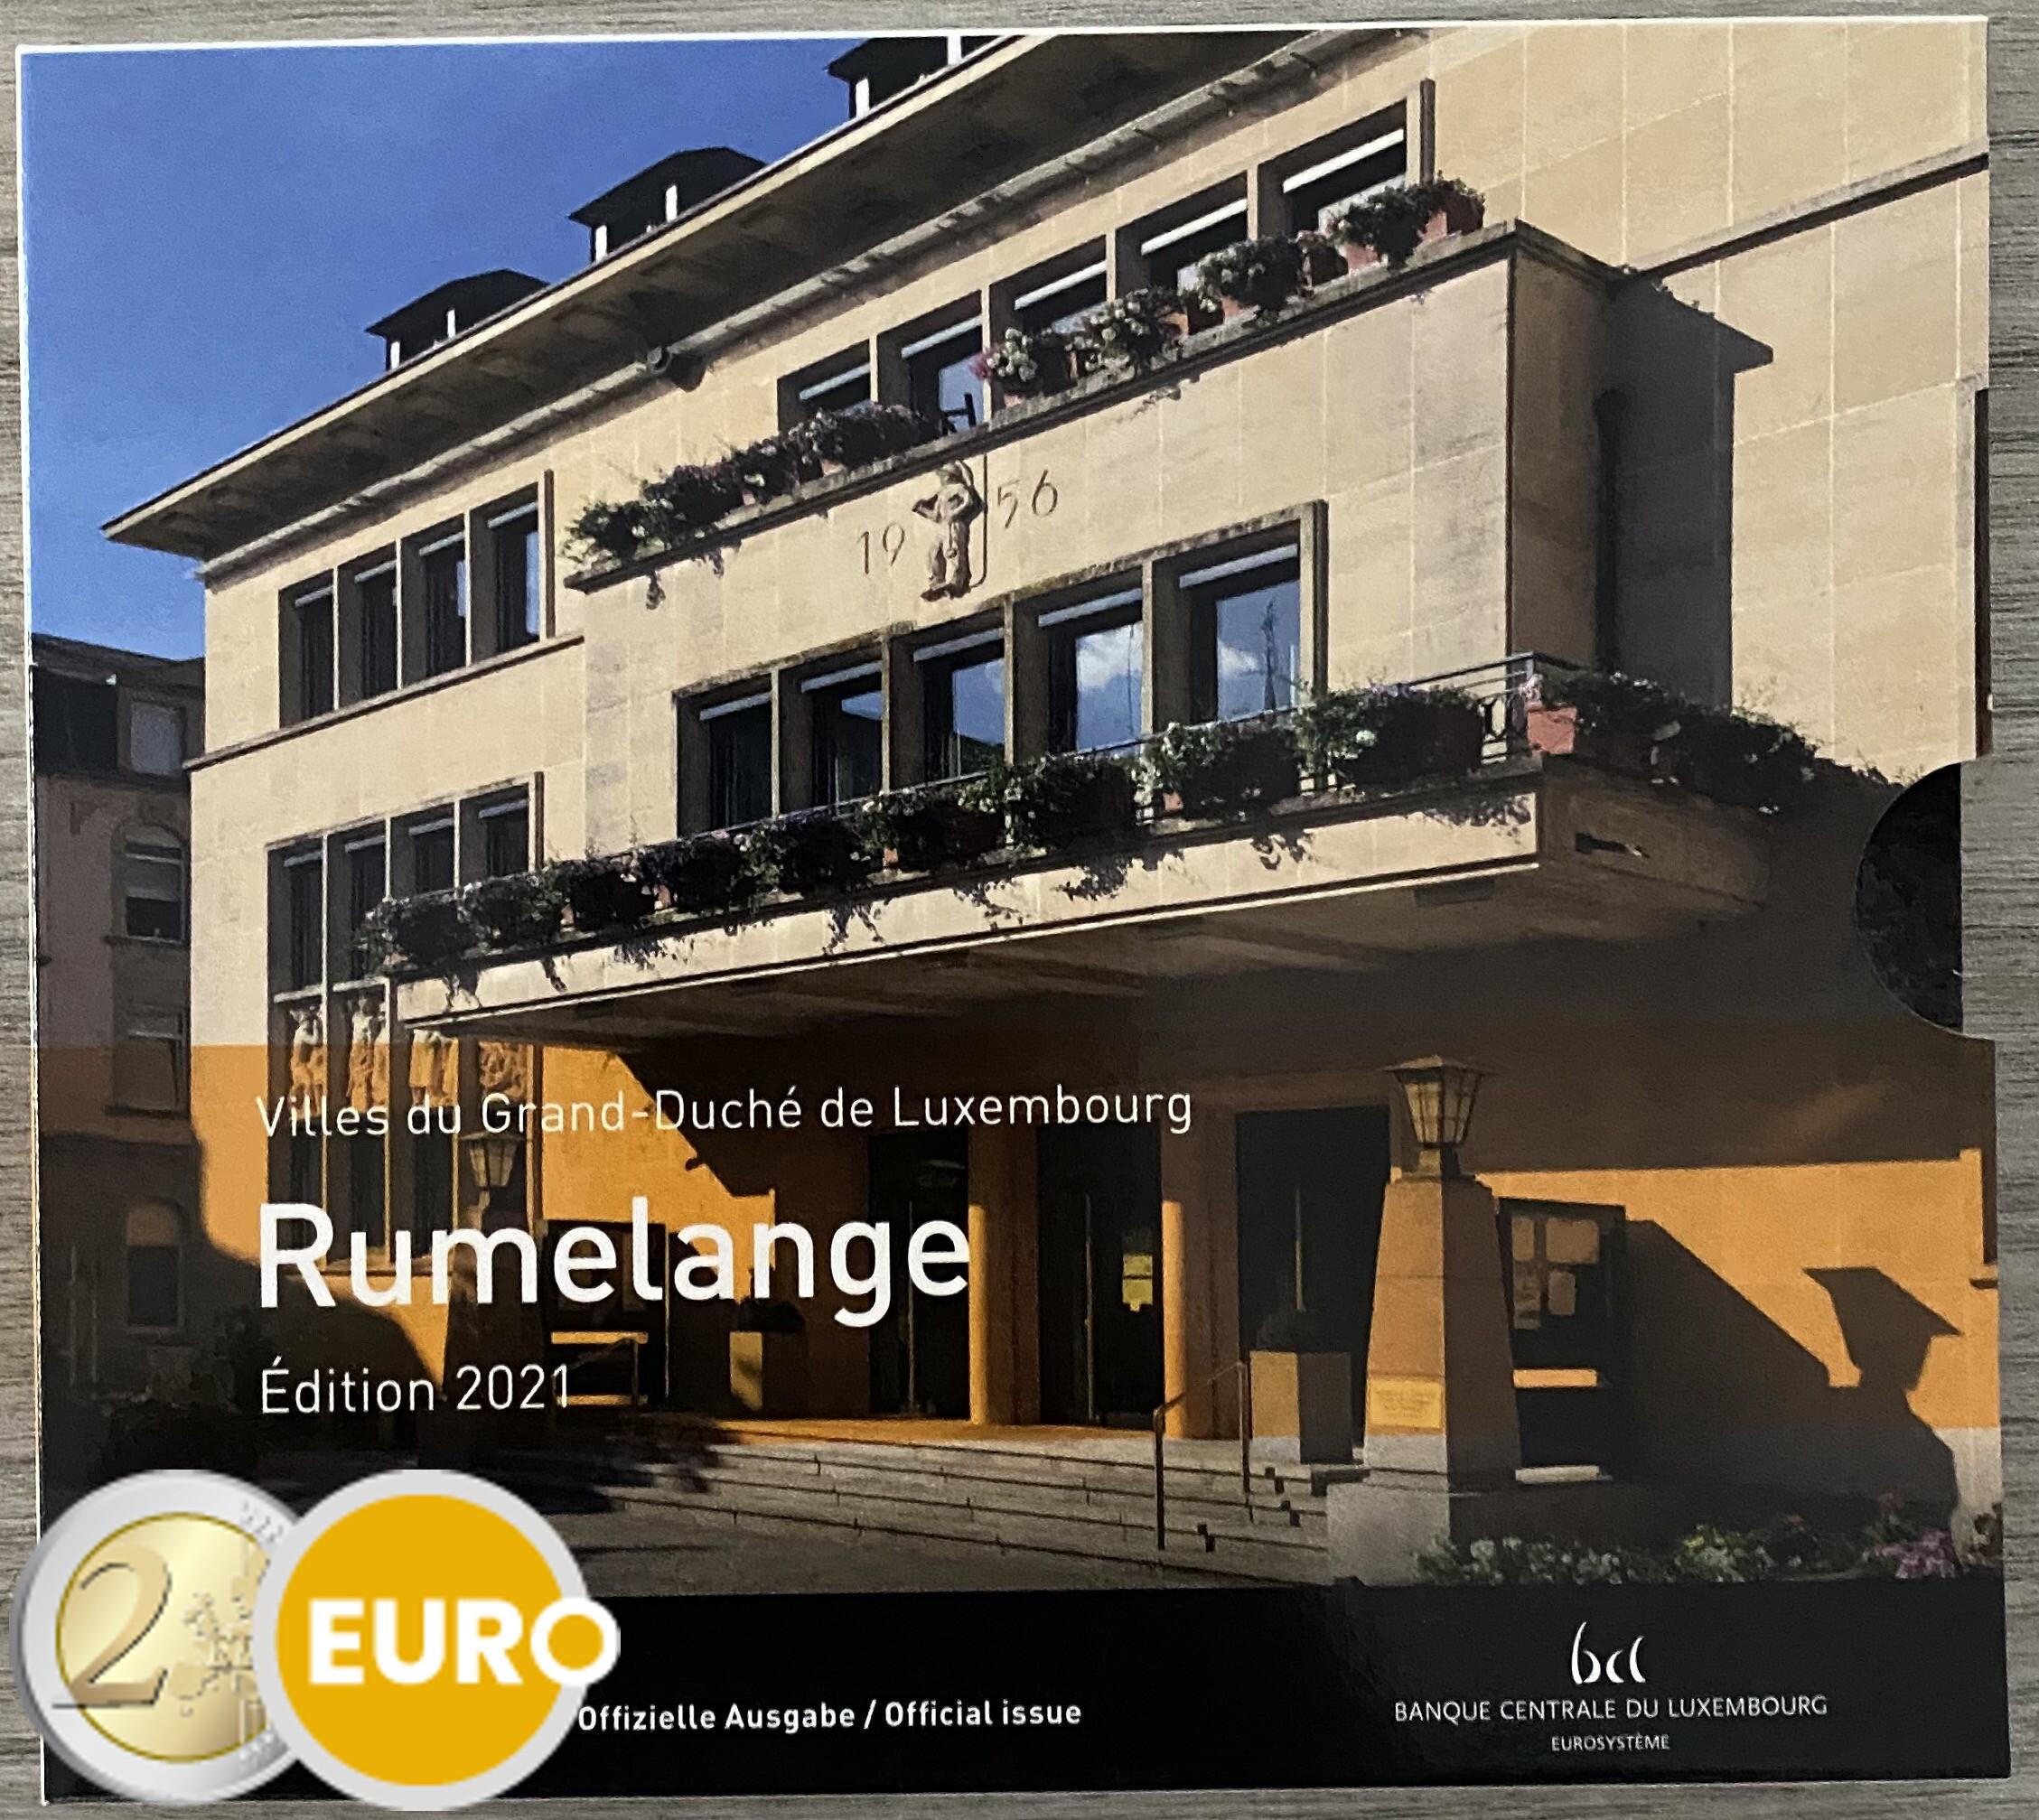 Serie de euro BU FDC Luxemburgo 2021 Rumelange + 2 euros nacimiento Juan foto